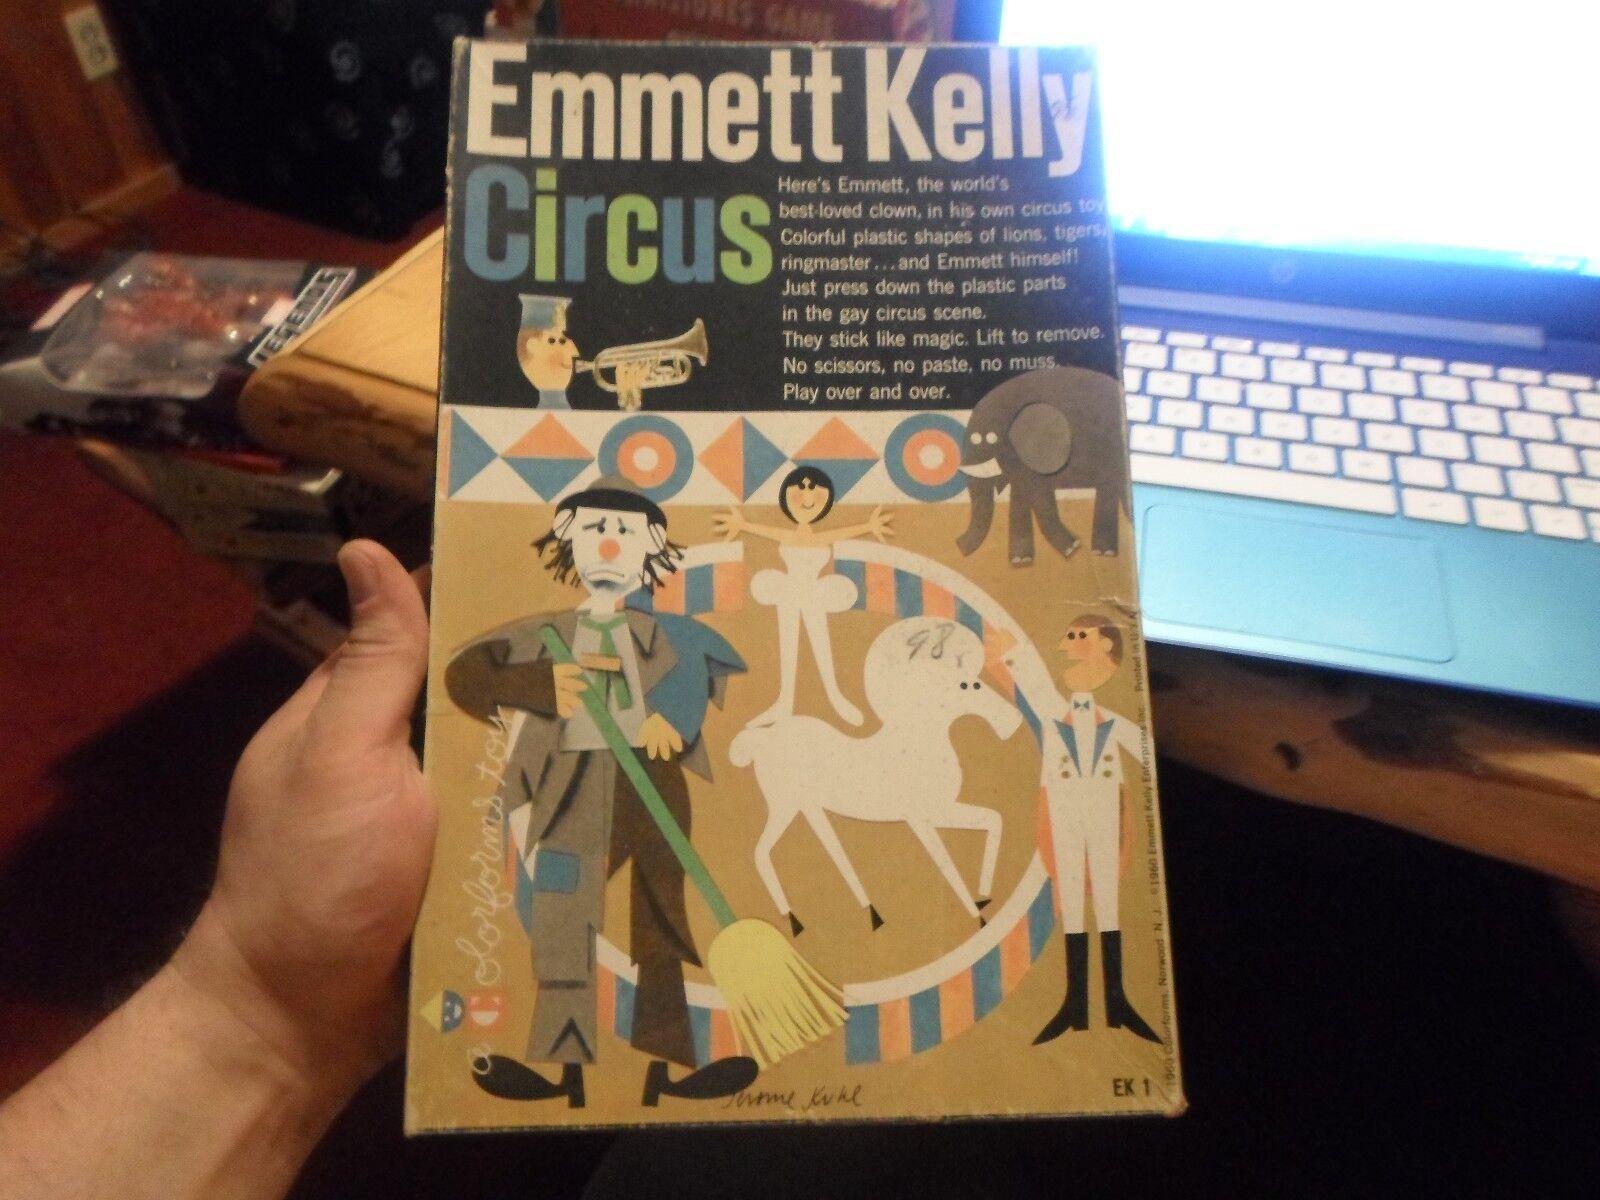 1960 emmett kelly Farbeform set komplett - zirkus - clown - jahrgang